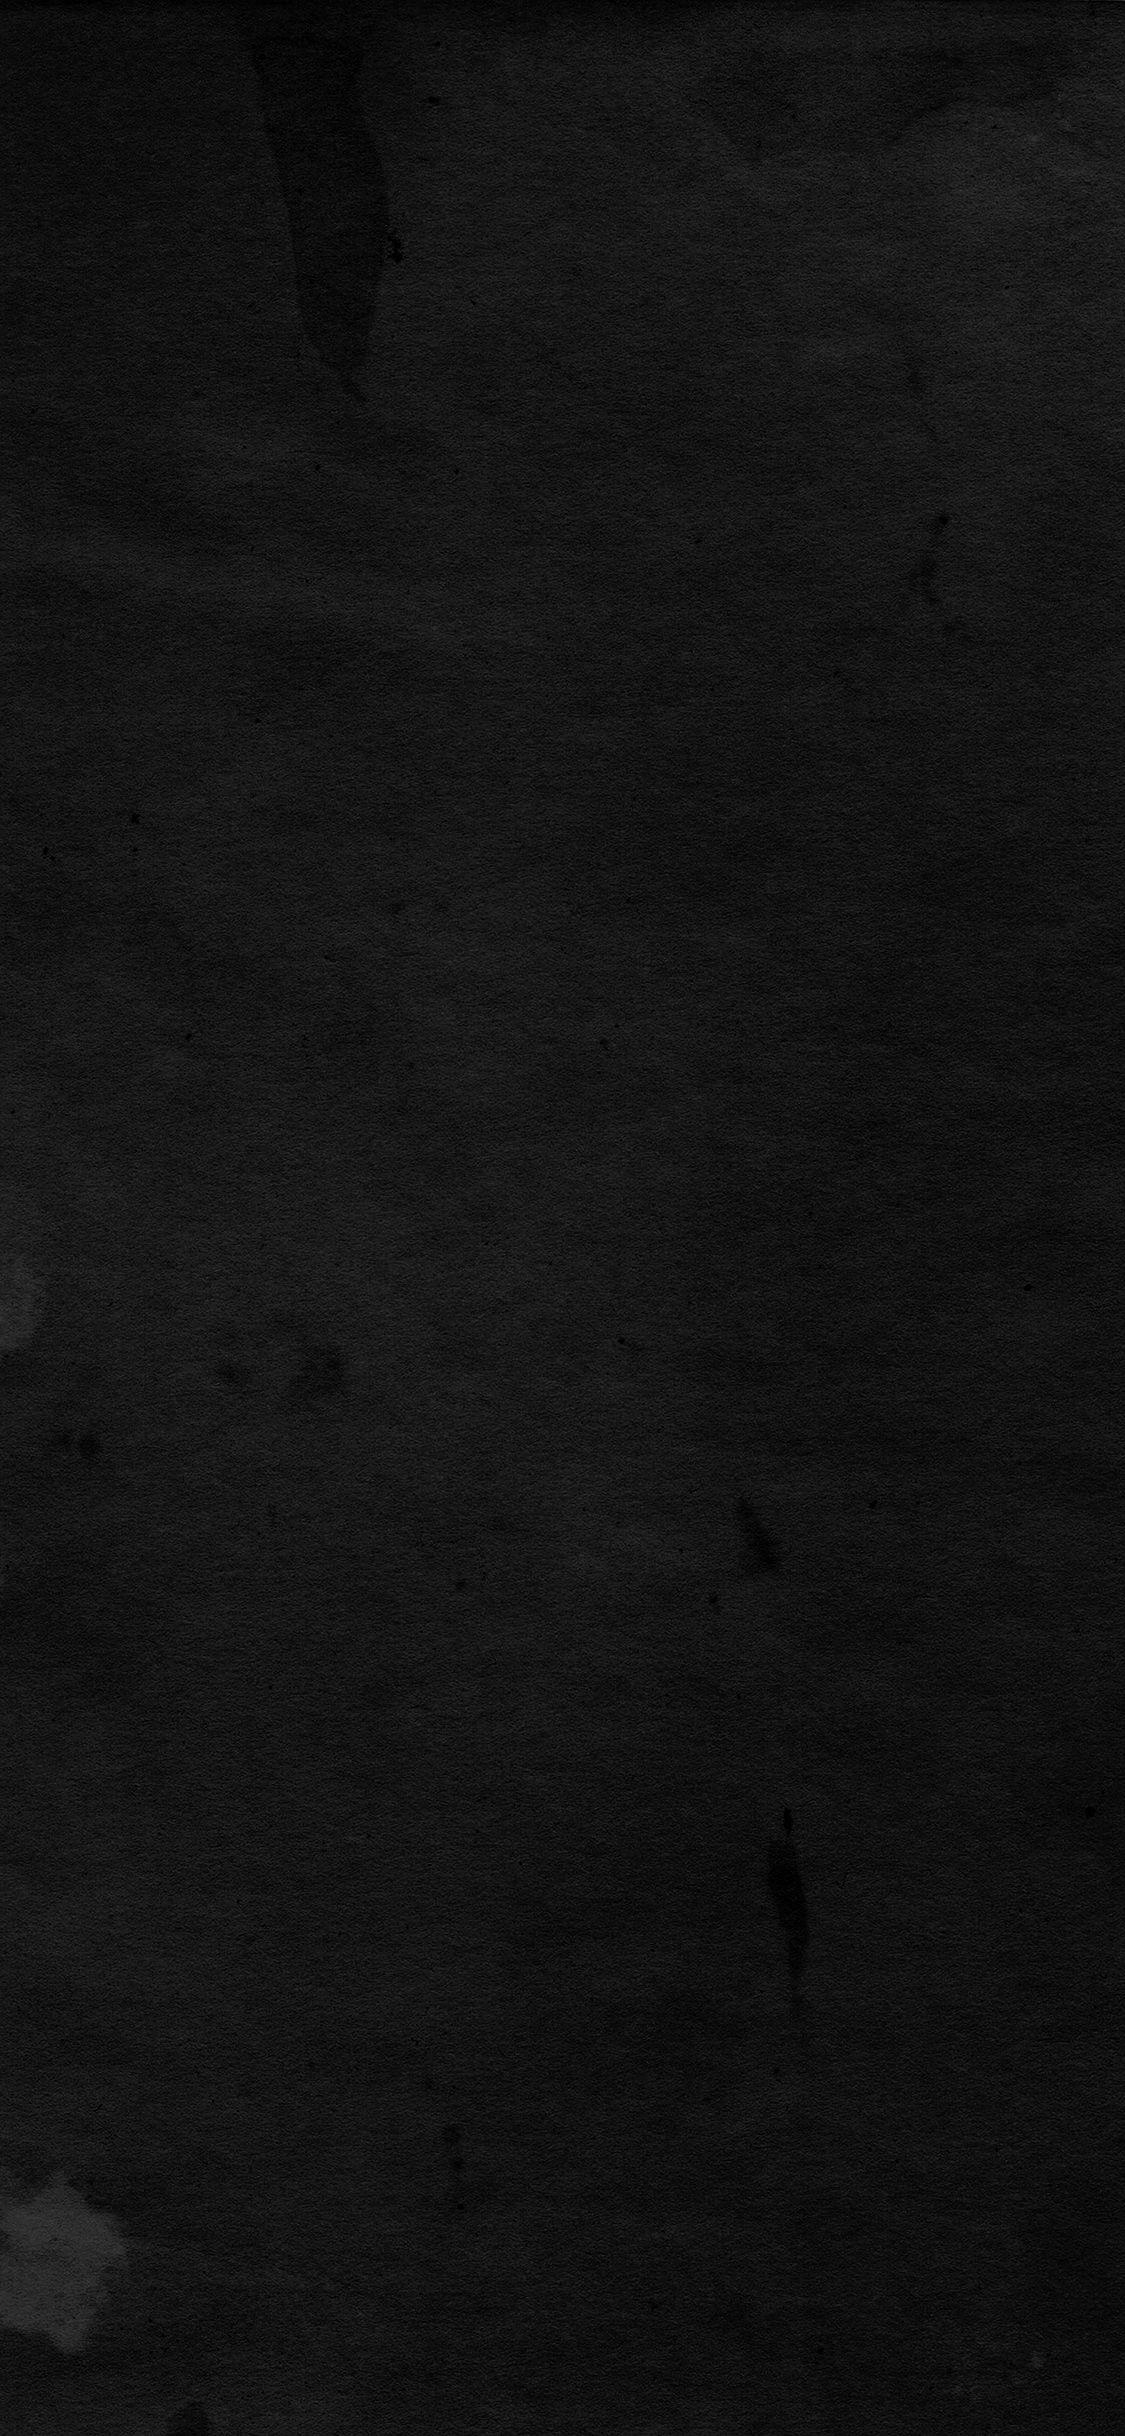 Black Iphone 11 Pro Max Wallpapers Wallpaper Cave